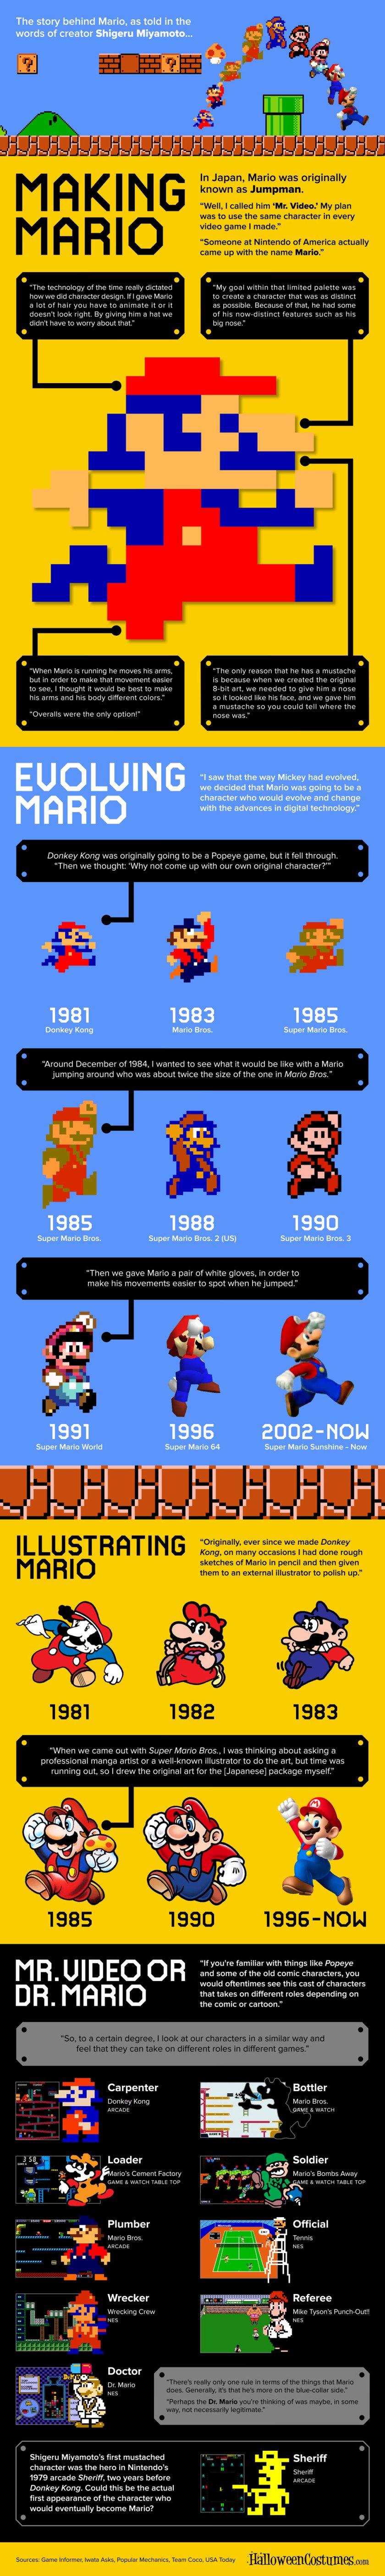 Making Mario Infographic